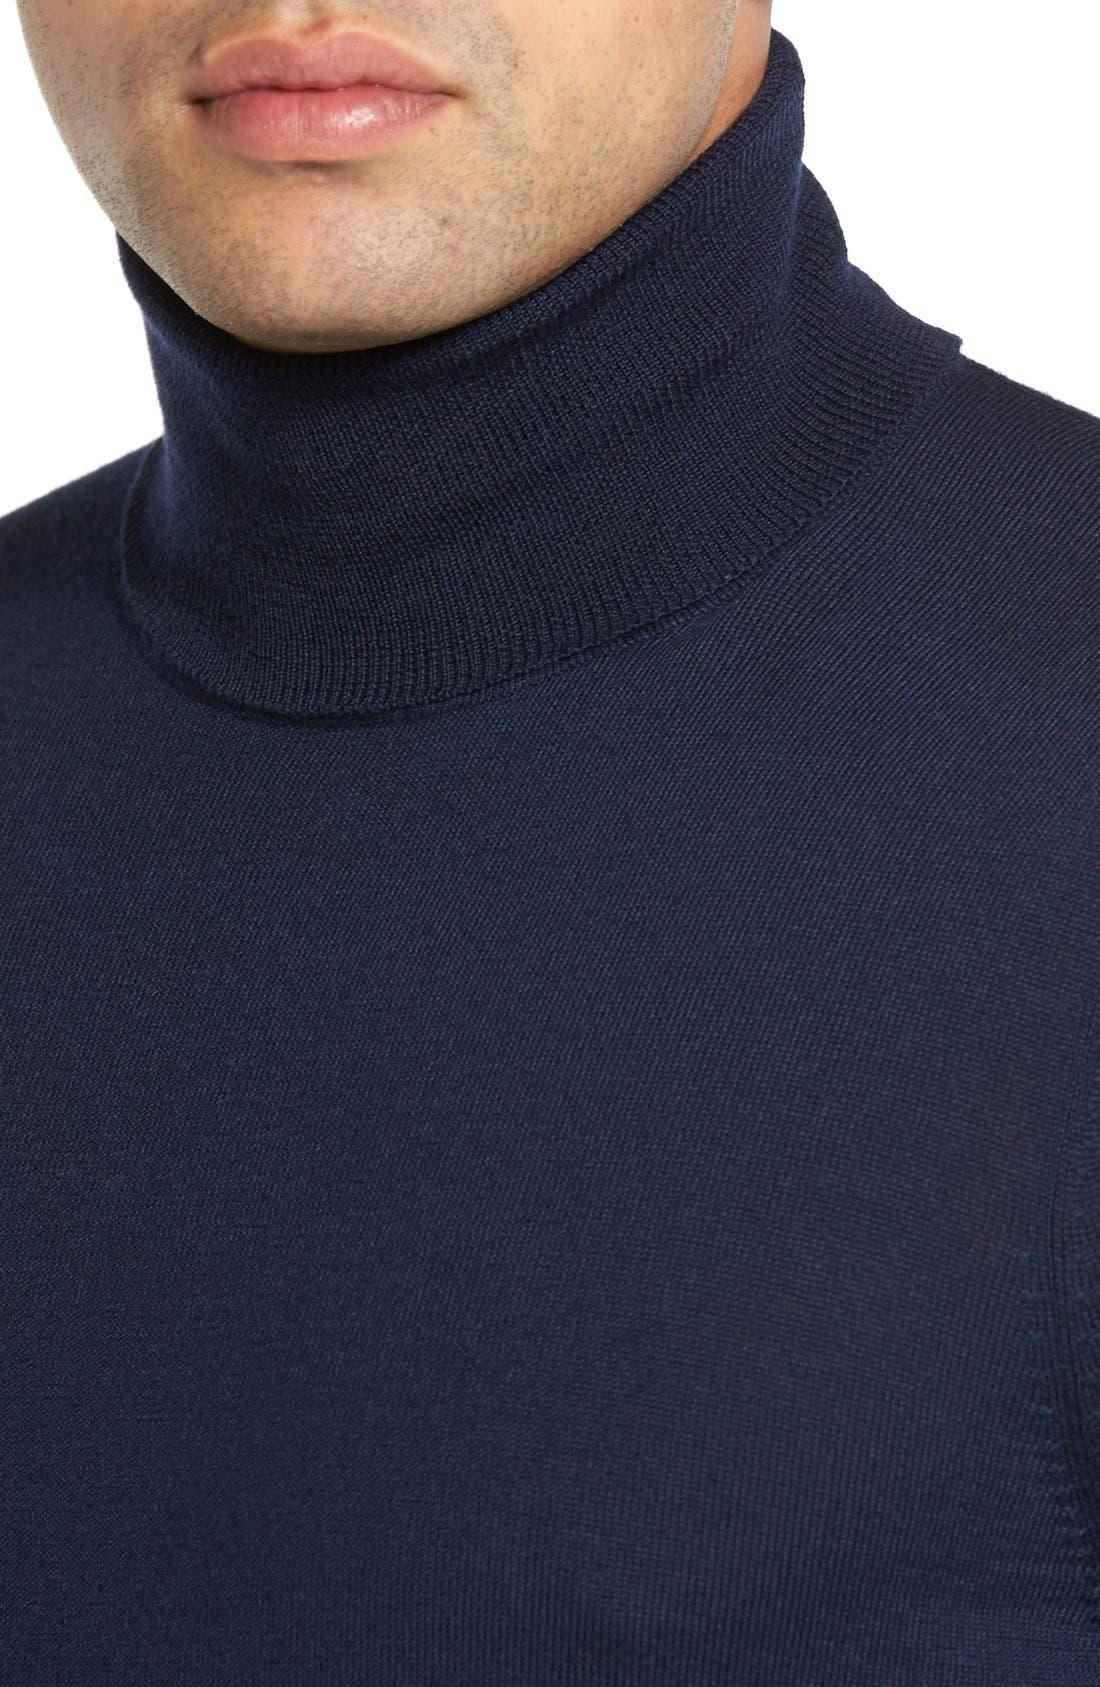 Alternate Image 4  - John W. Nordstrom® Wool Turtleneck Sweater